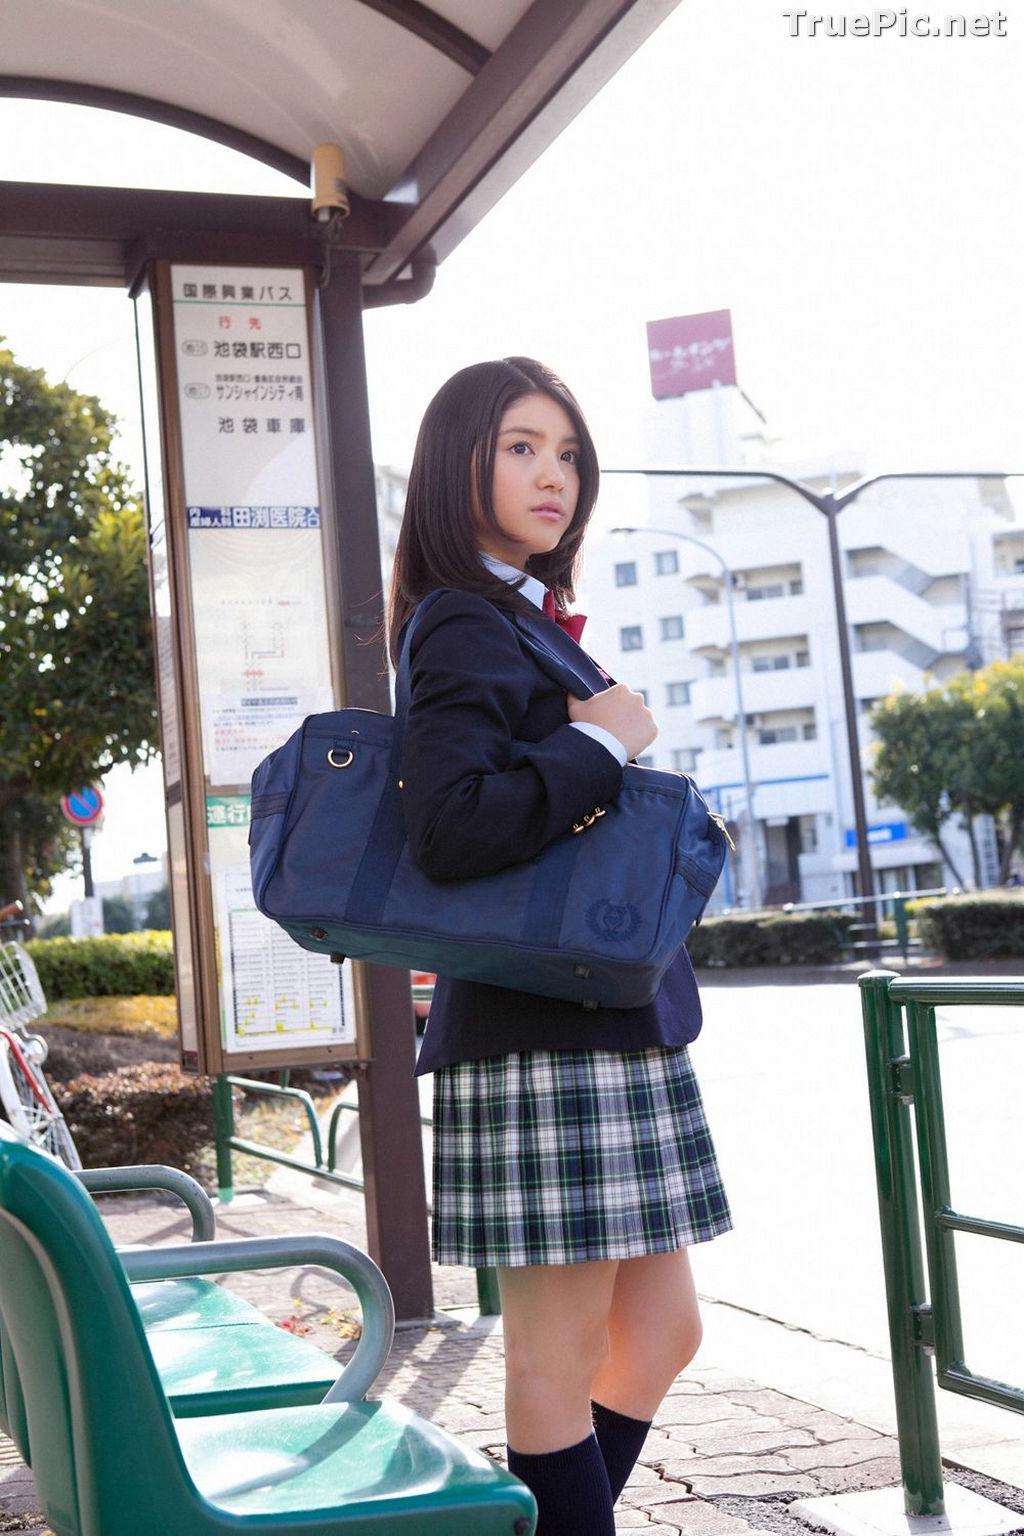 Image [YS Web] Vol.506 - Japanese Actress and Singer - Umika Kawashima - TruePic.net - Picture-1